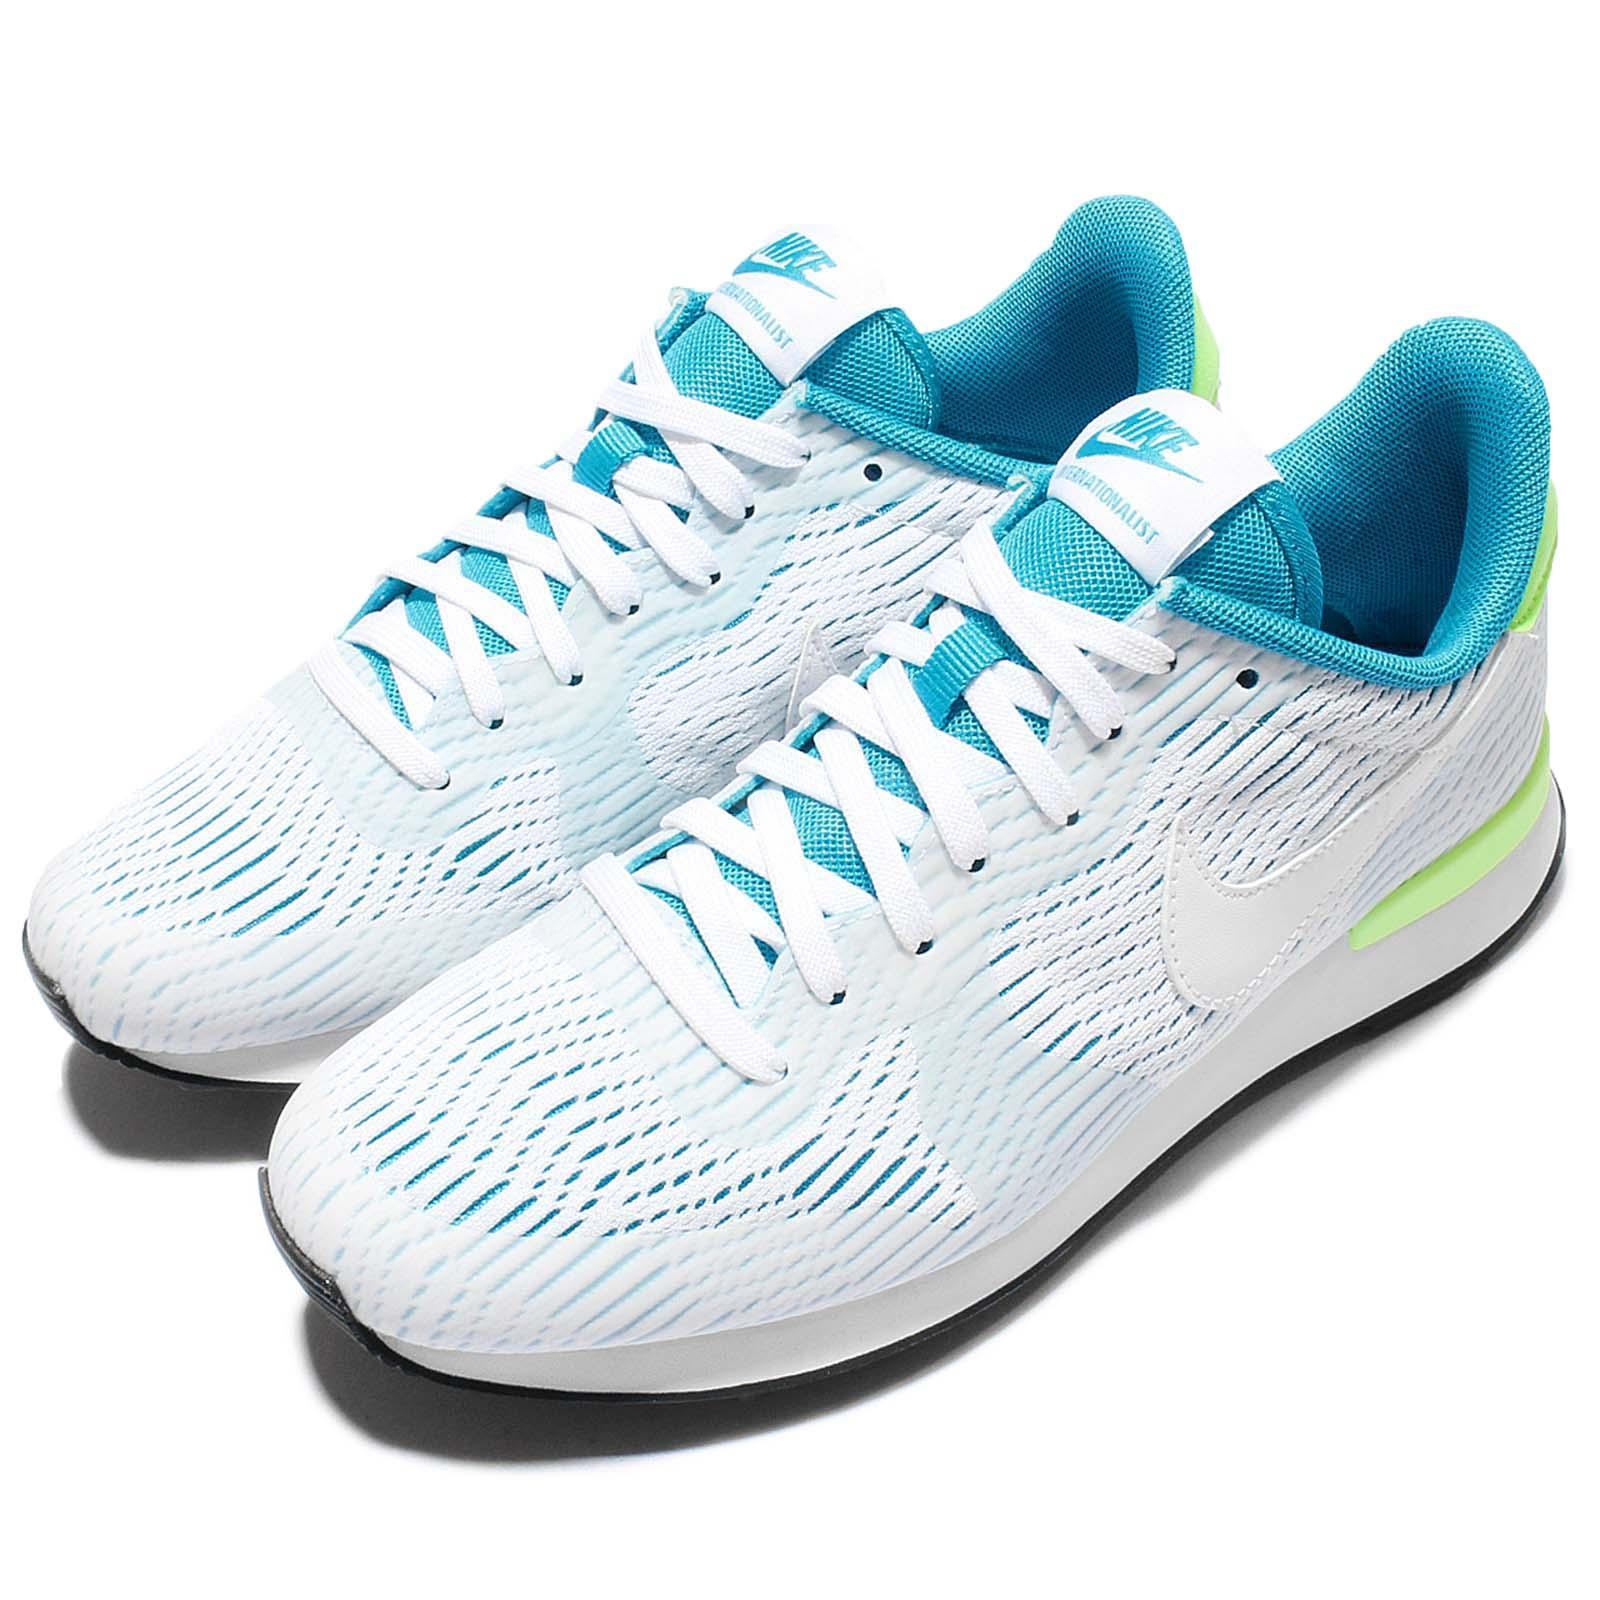 Wmns Nike Internationalist EM Blue Green Women Vintage Trainers Shoe 833815-100